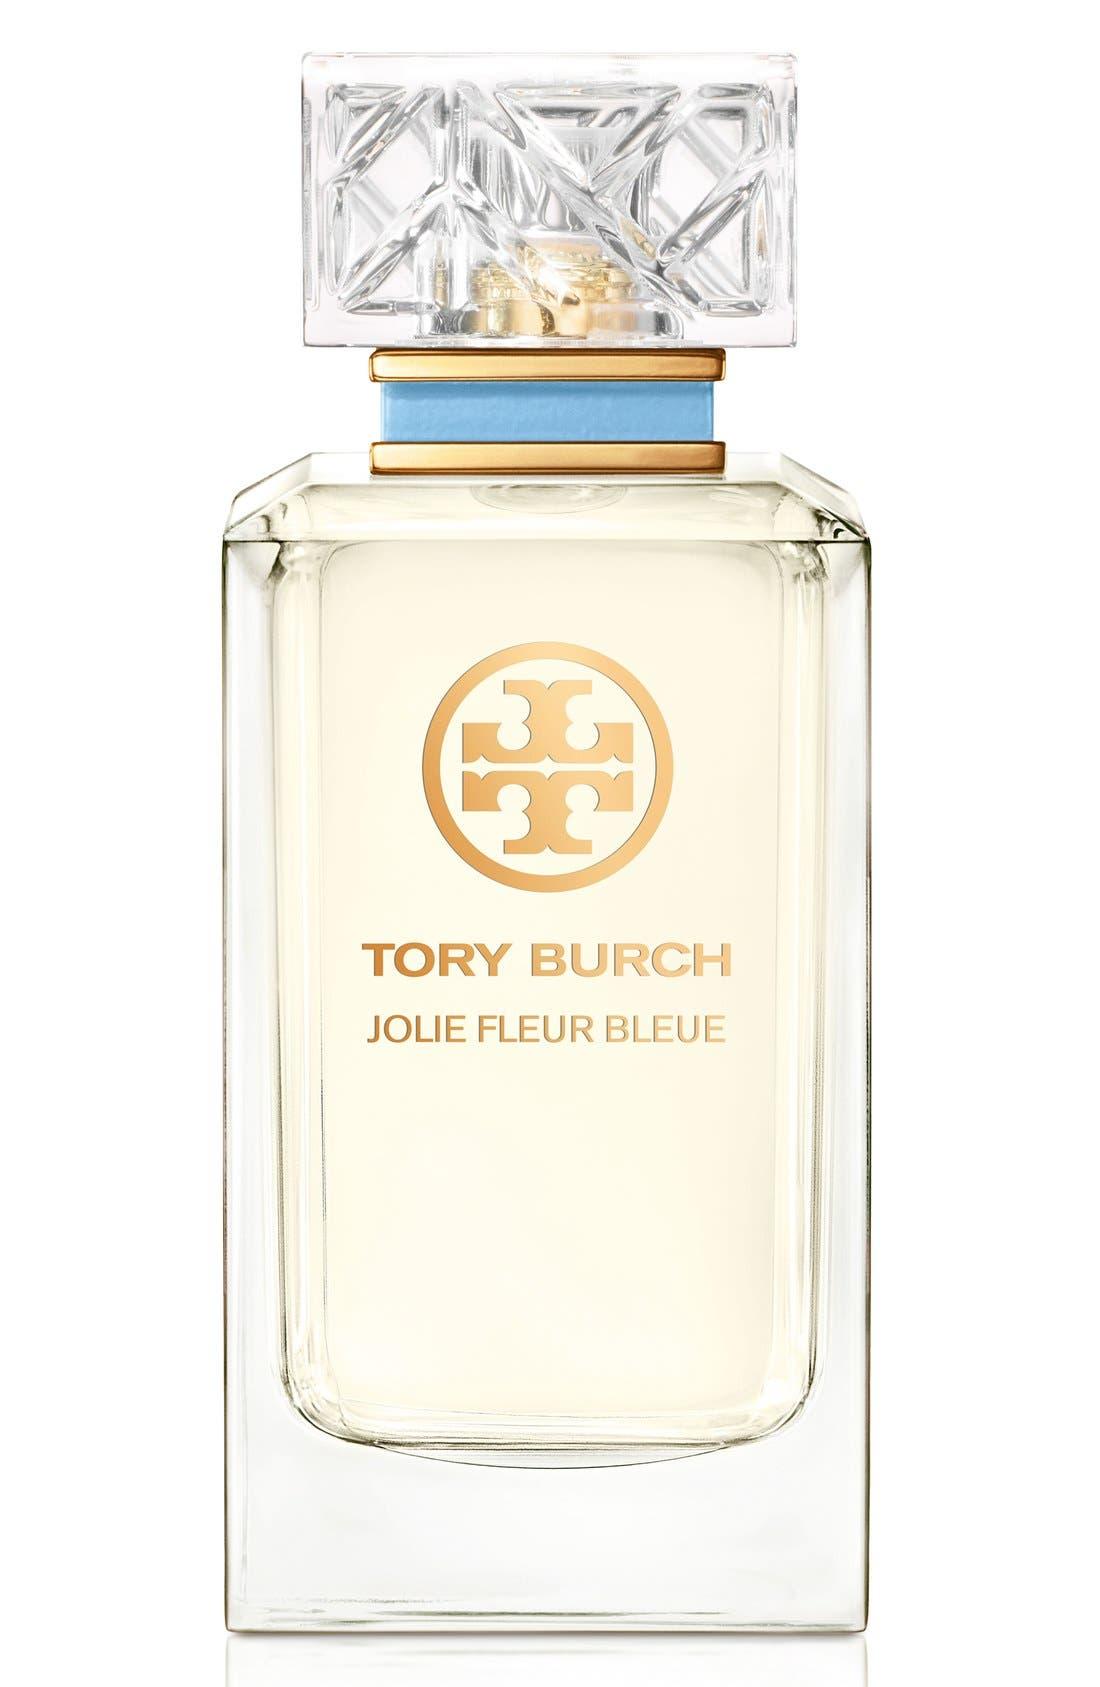 Tory Burch Jolie Fleur - Bleue Eau de Parfum Spray